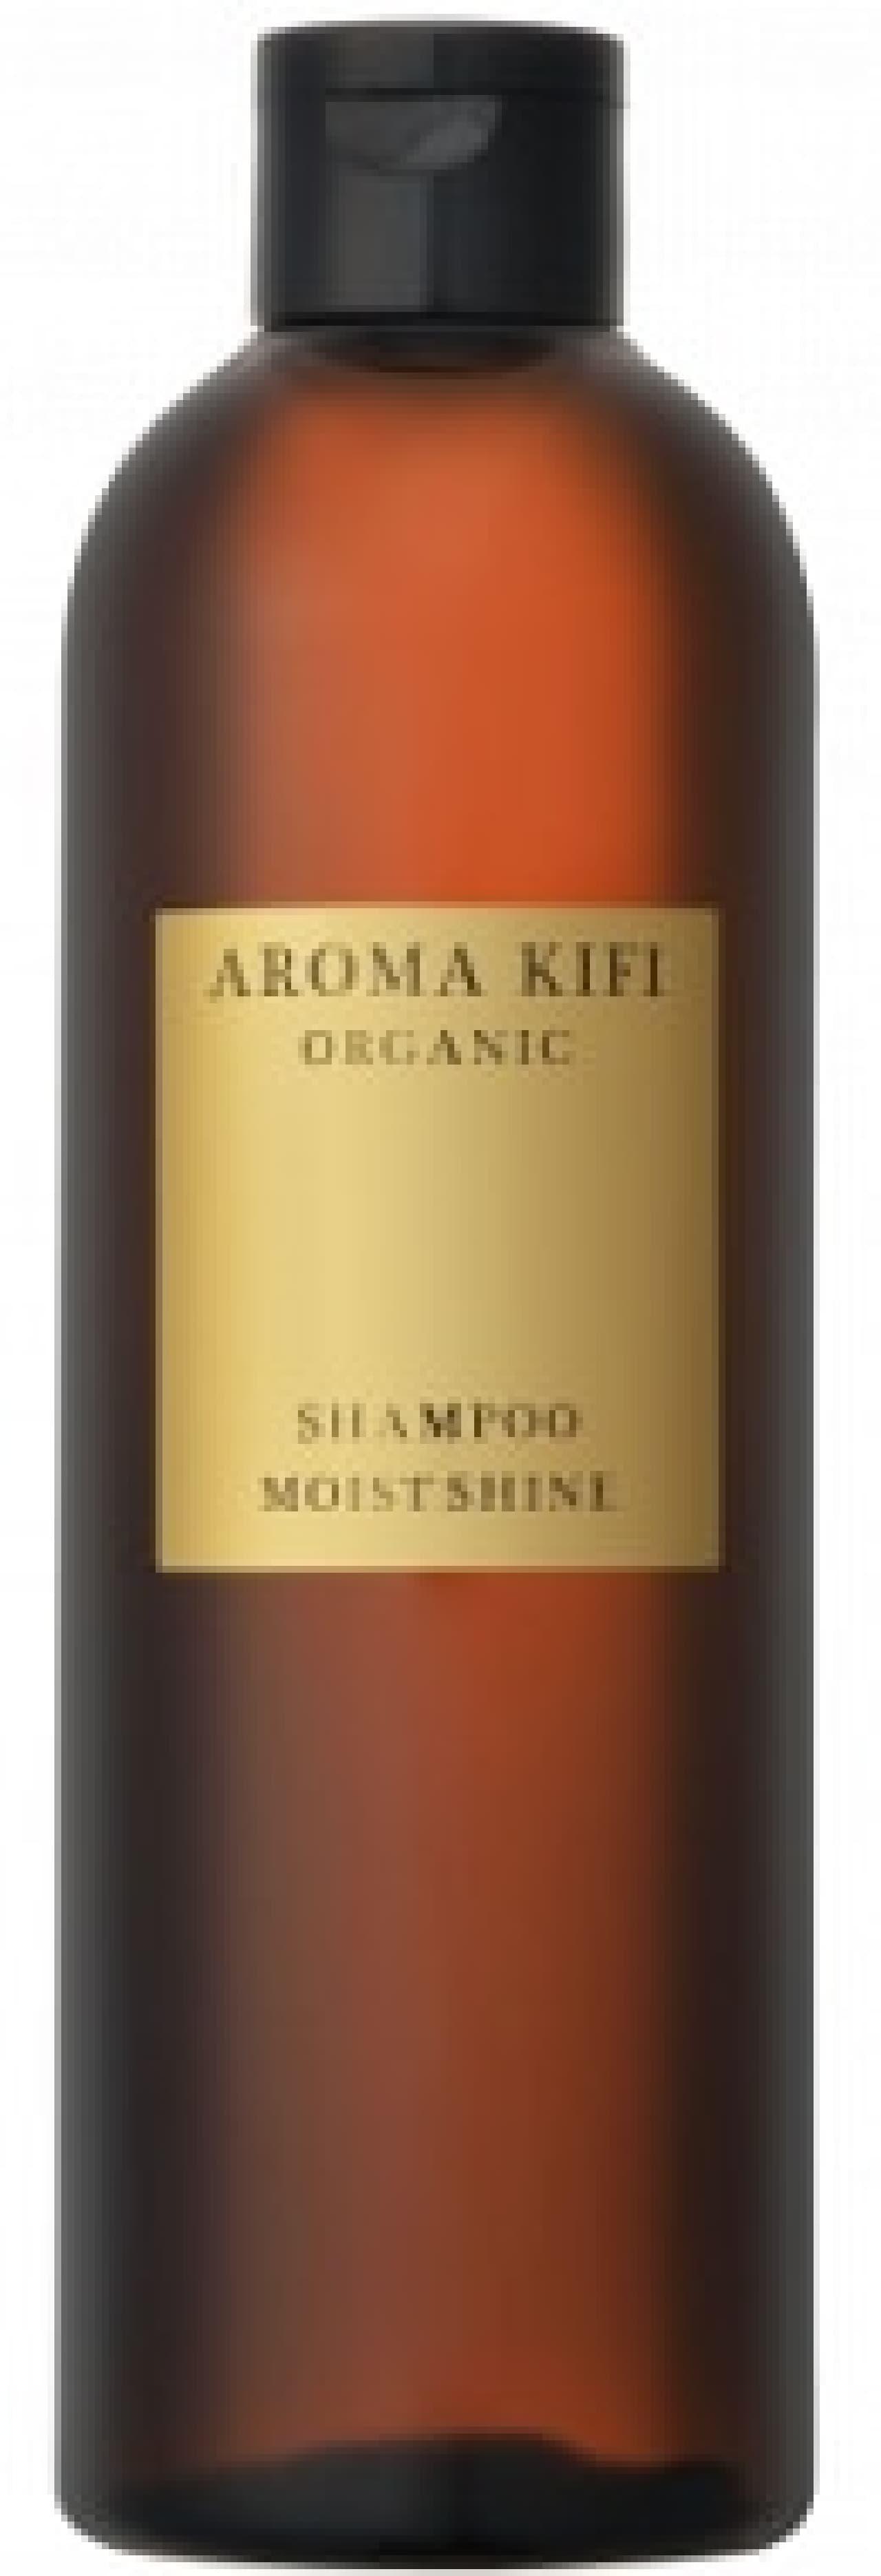 AROMA KIFI オーガニック シャンプー(モイストシャイン)